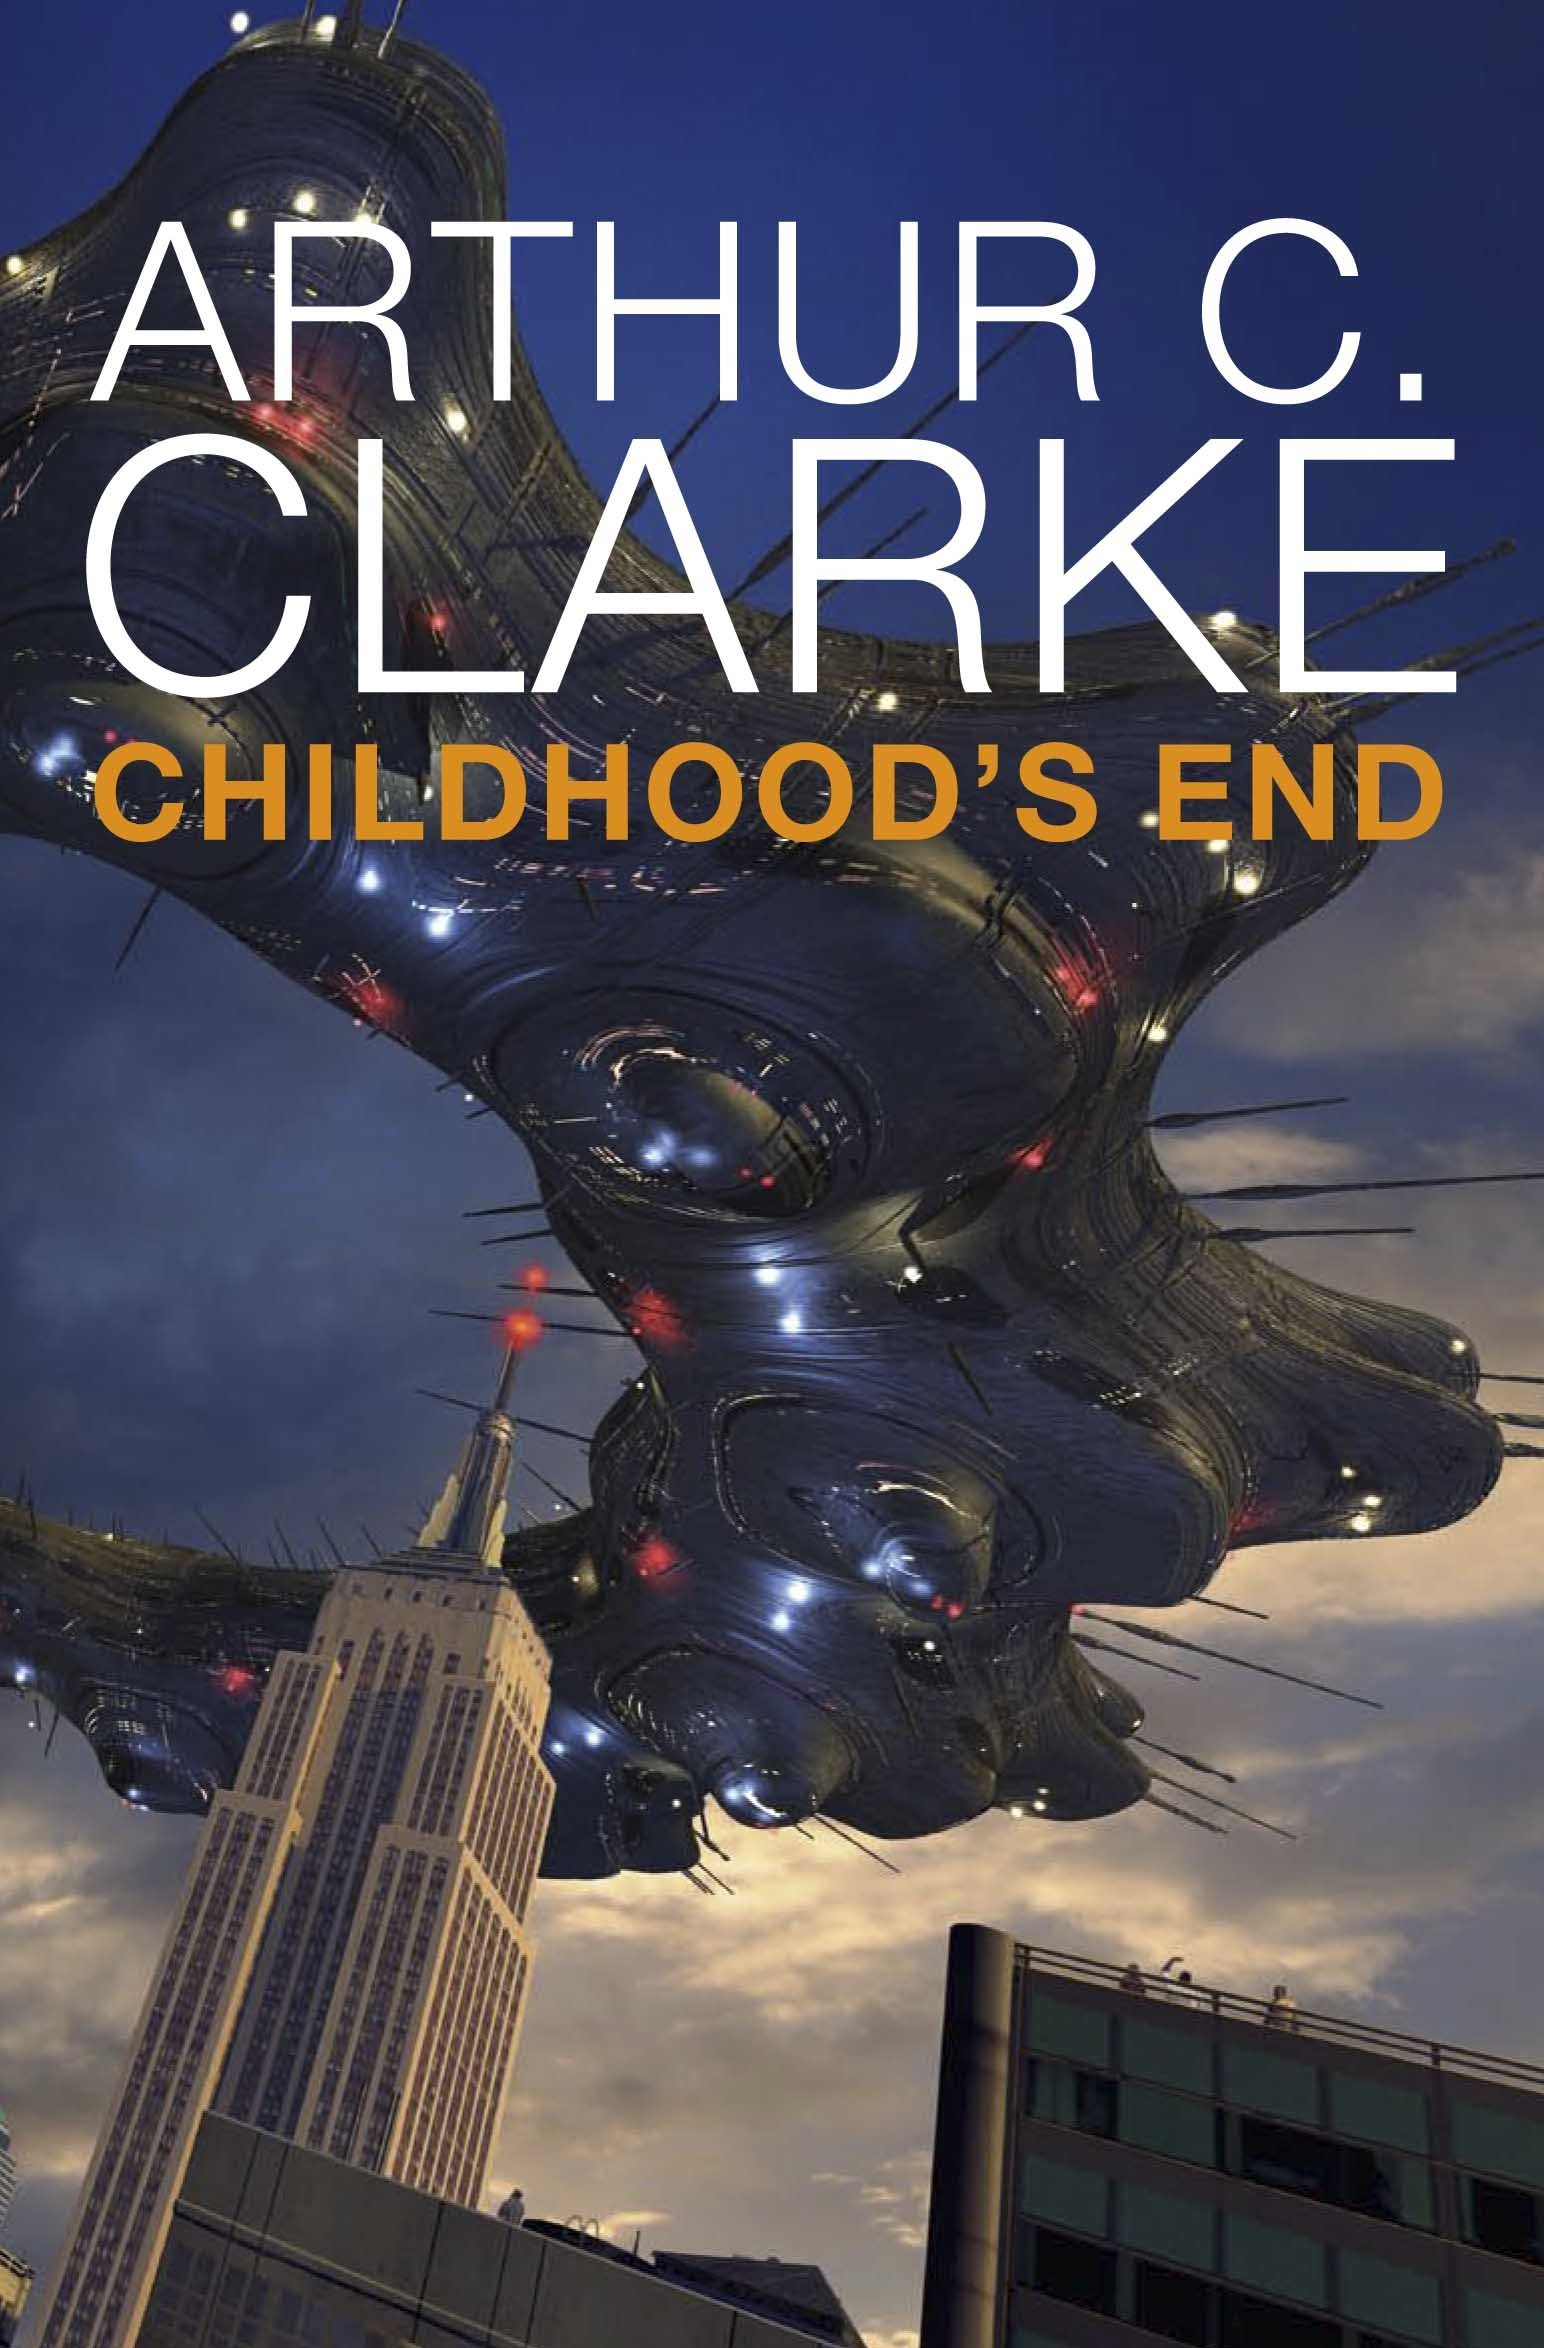 Childhood's End: Amazon.co.uk: C Clarke, Arthur: 9780330514019: Books